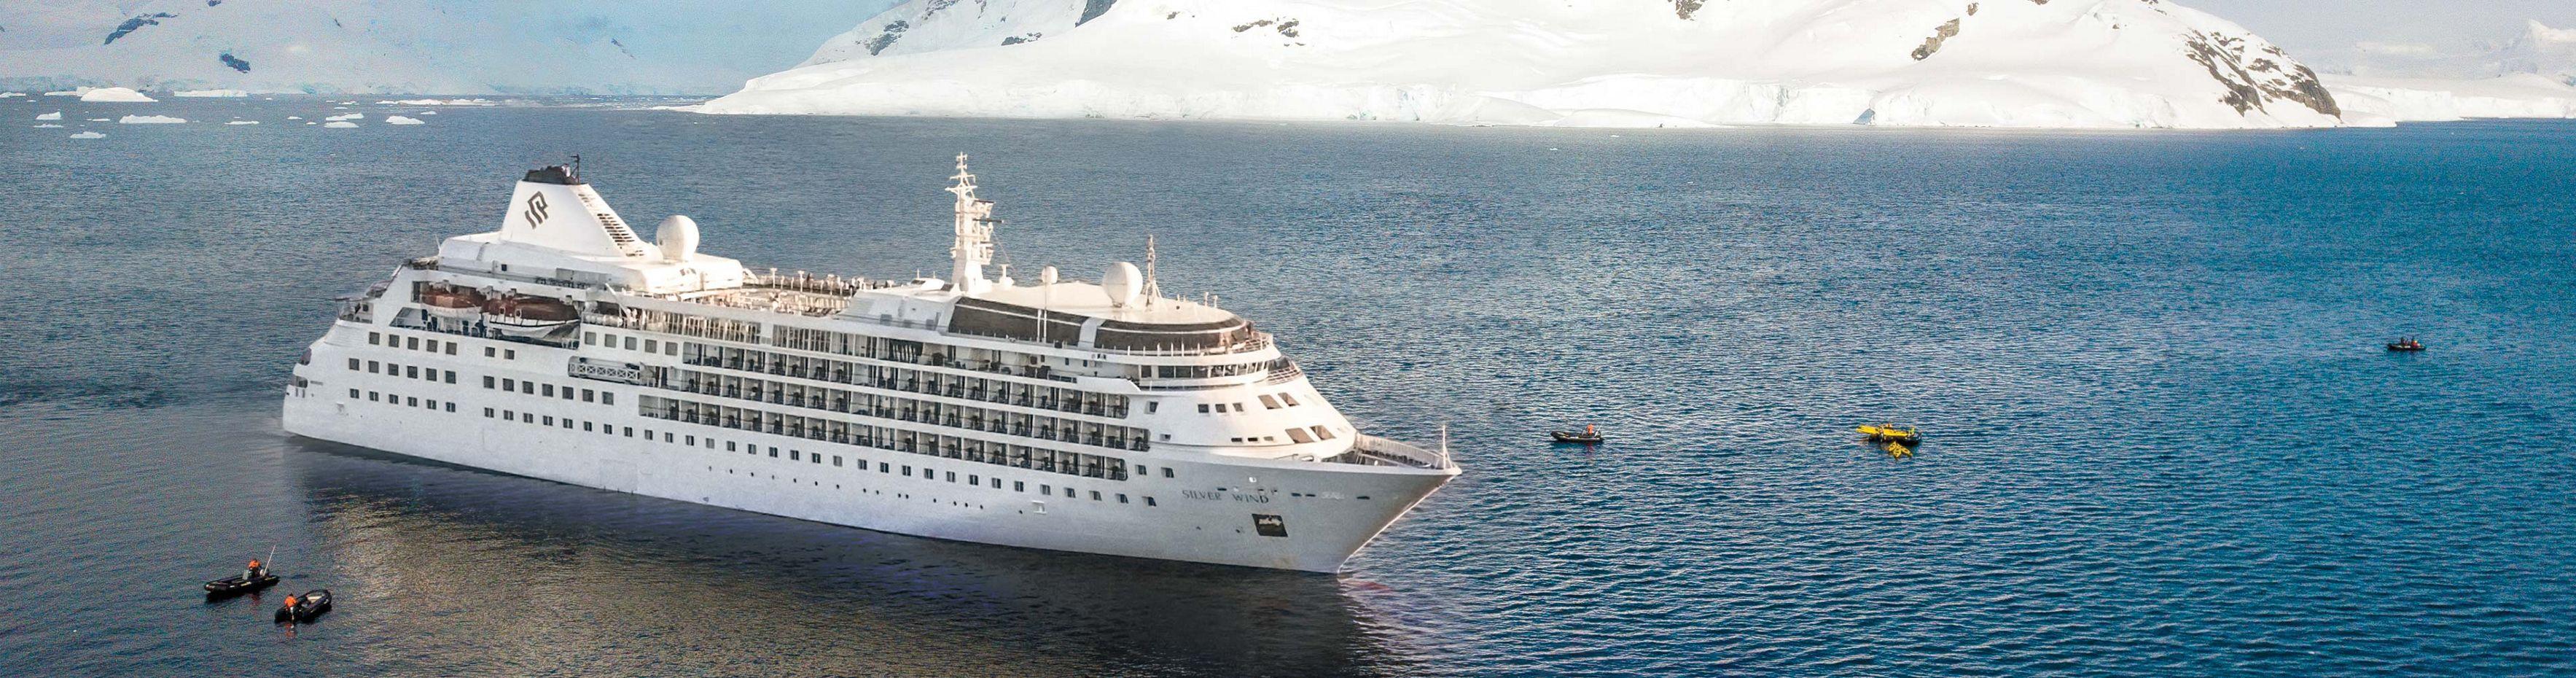 Silversea Luxury Cruises - Press Release December 2018